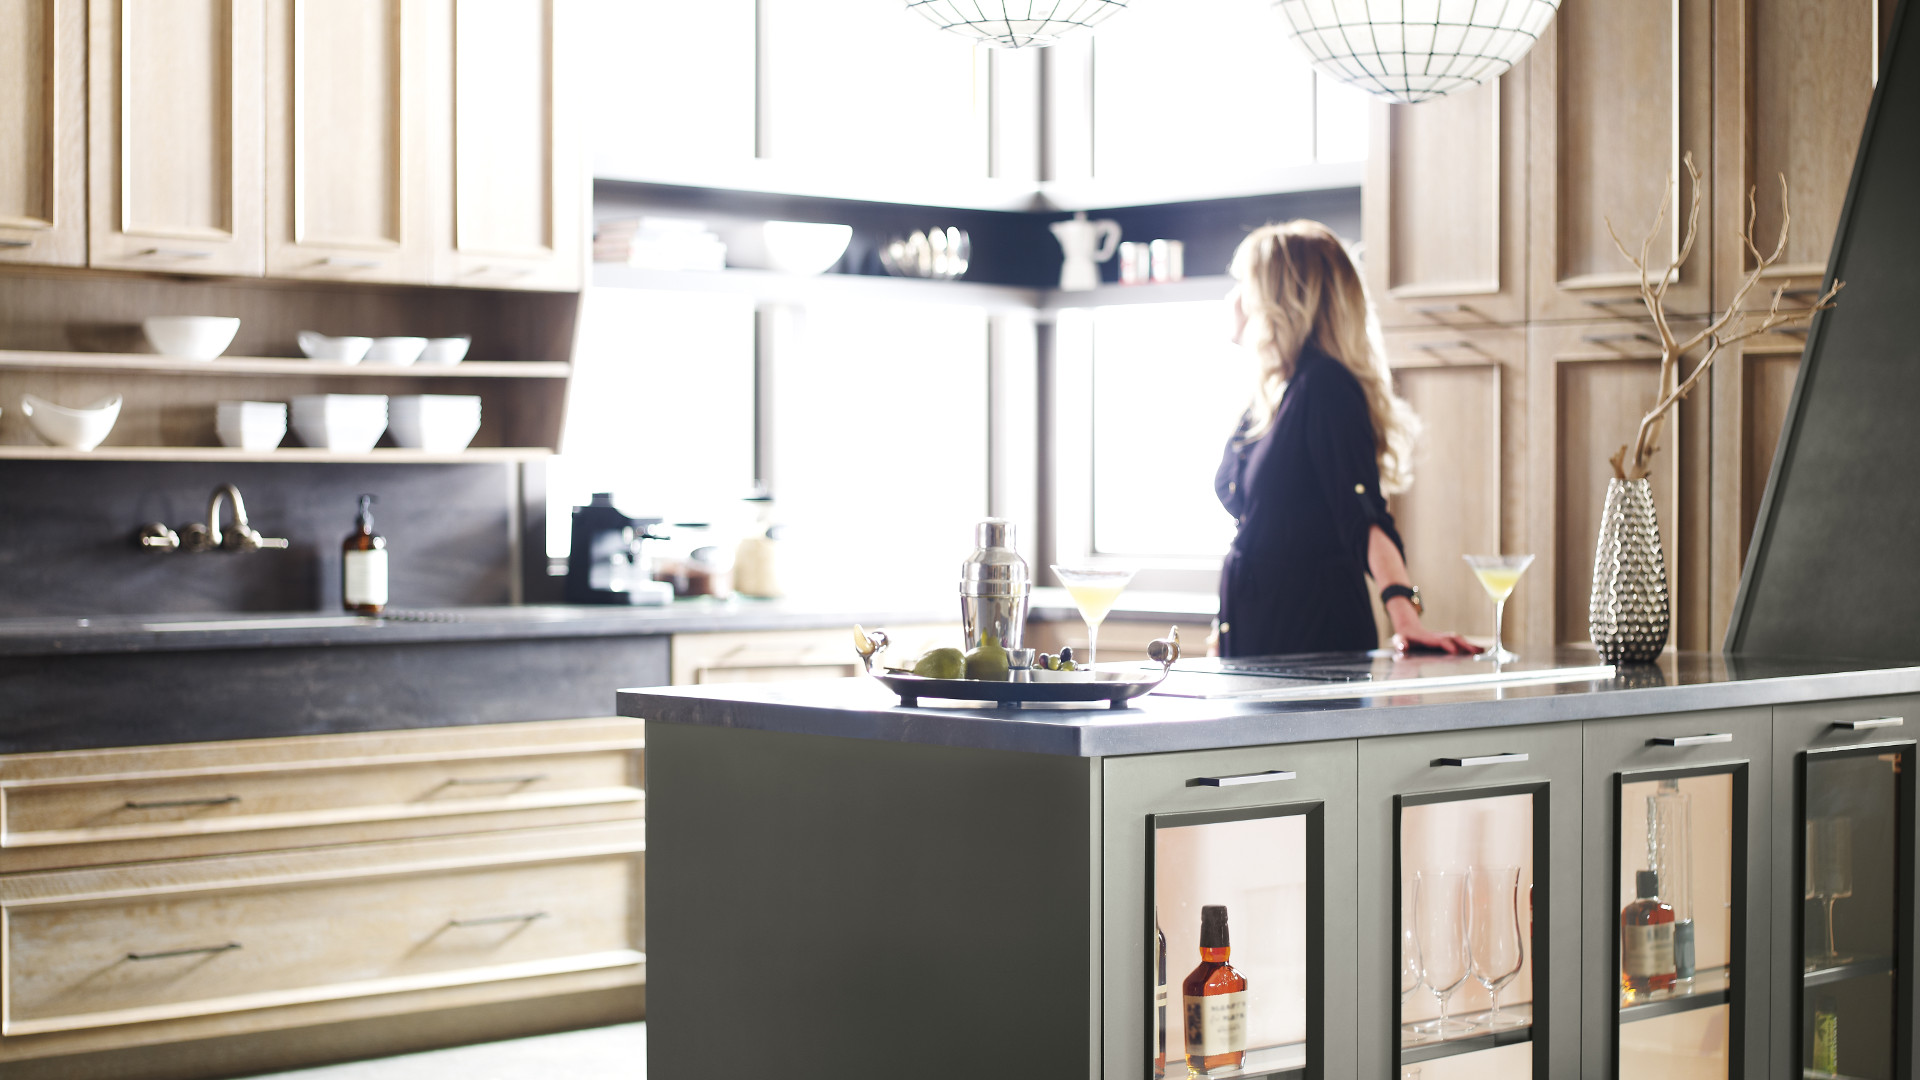 EKB | Kitchens and Interior Design and Remodels